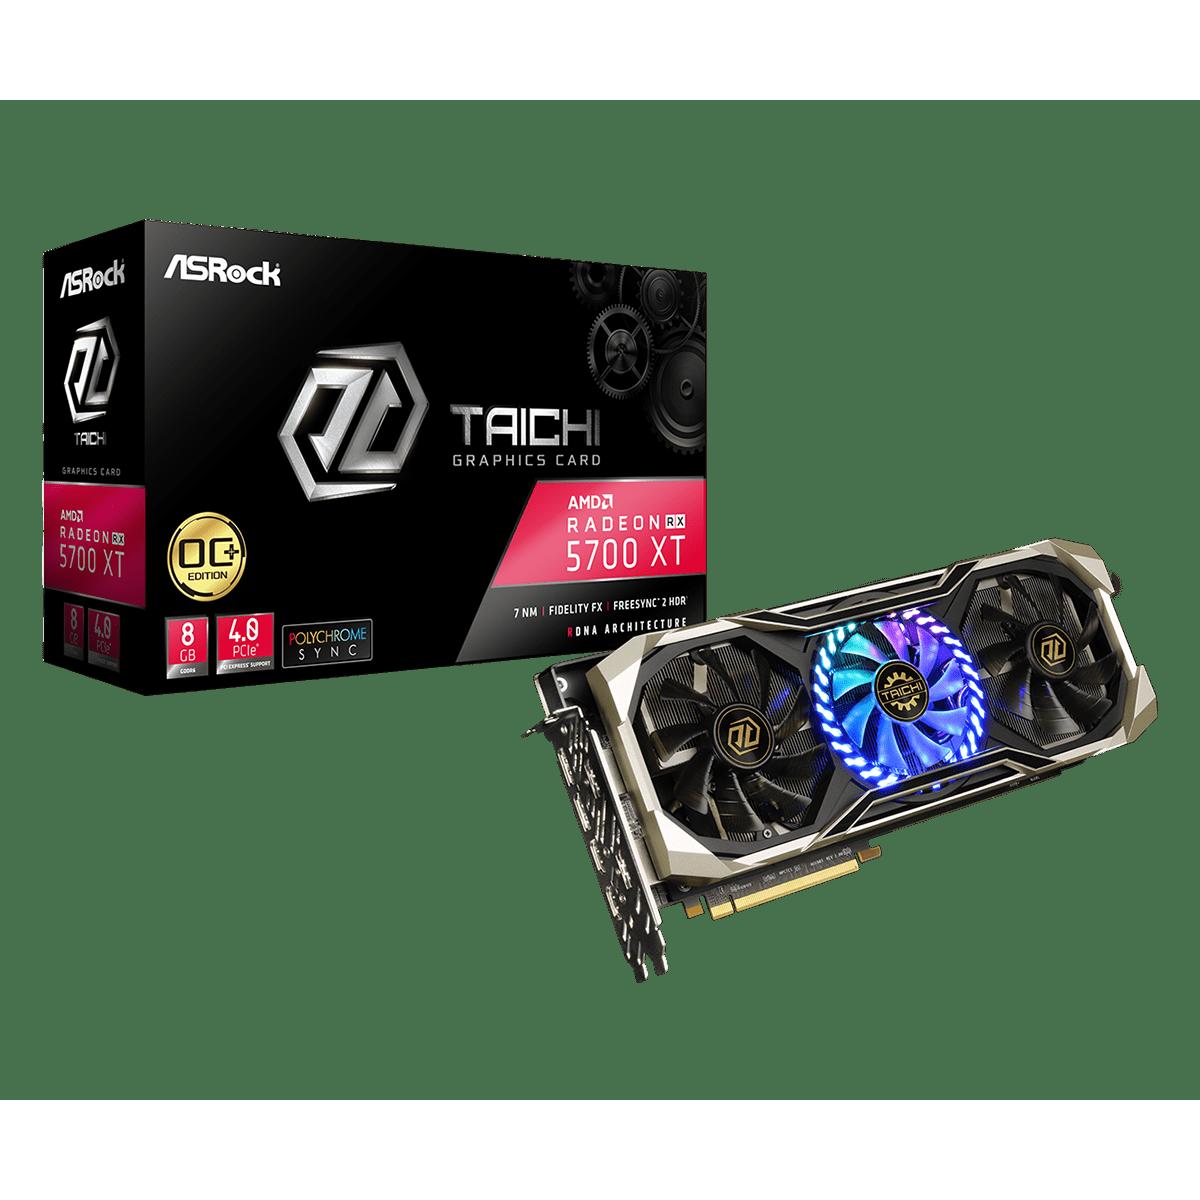 Placa de Vídeo Asrock Radeon Navi RX 5700 XT Taichi X 8G OC+, Triple Fan, 8GB GDDR6, 256Bit, 90-GA19ZZ-00UANZ